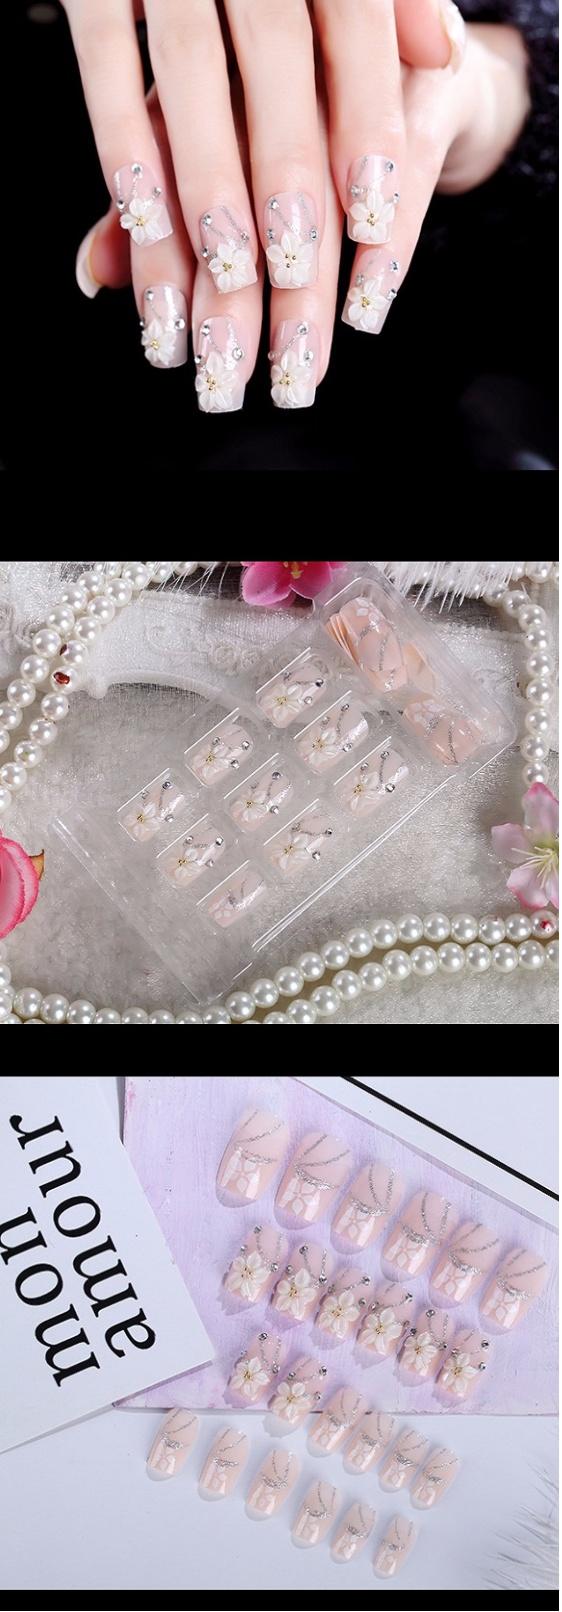 Jual Jbs Nails Kuku Palsu Wedding 3d A39 Harga Rp 40000 Fake Nail Art A18 Reviews